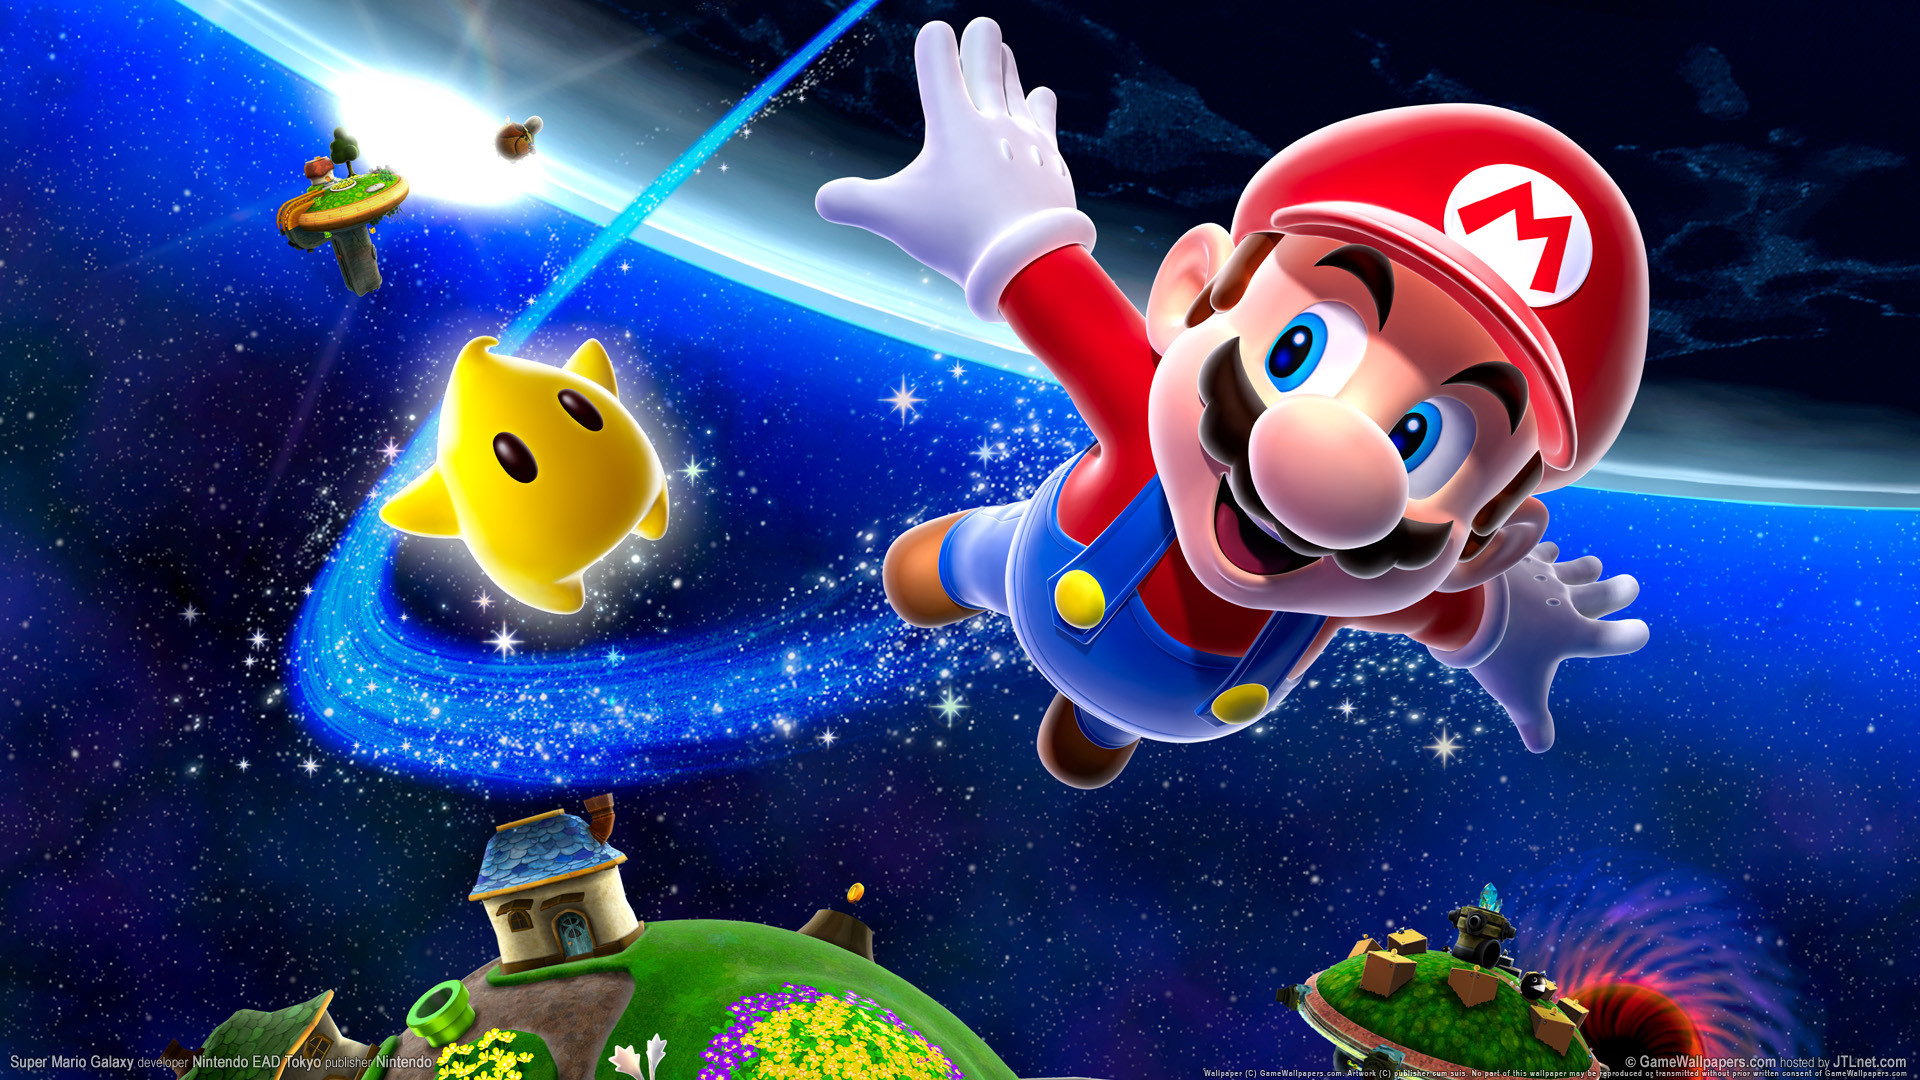 Mario Wallpaper Hd 79 Images